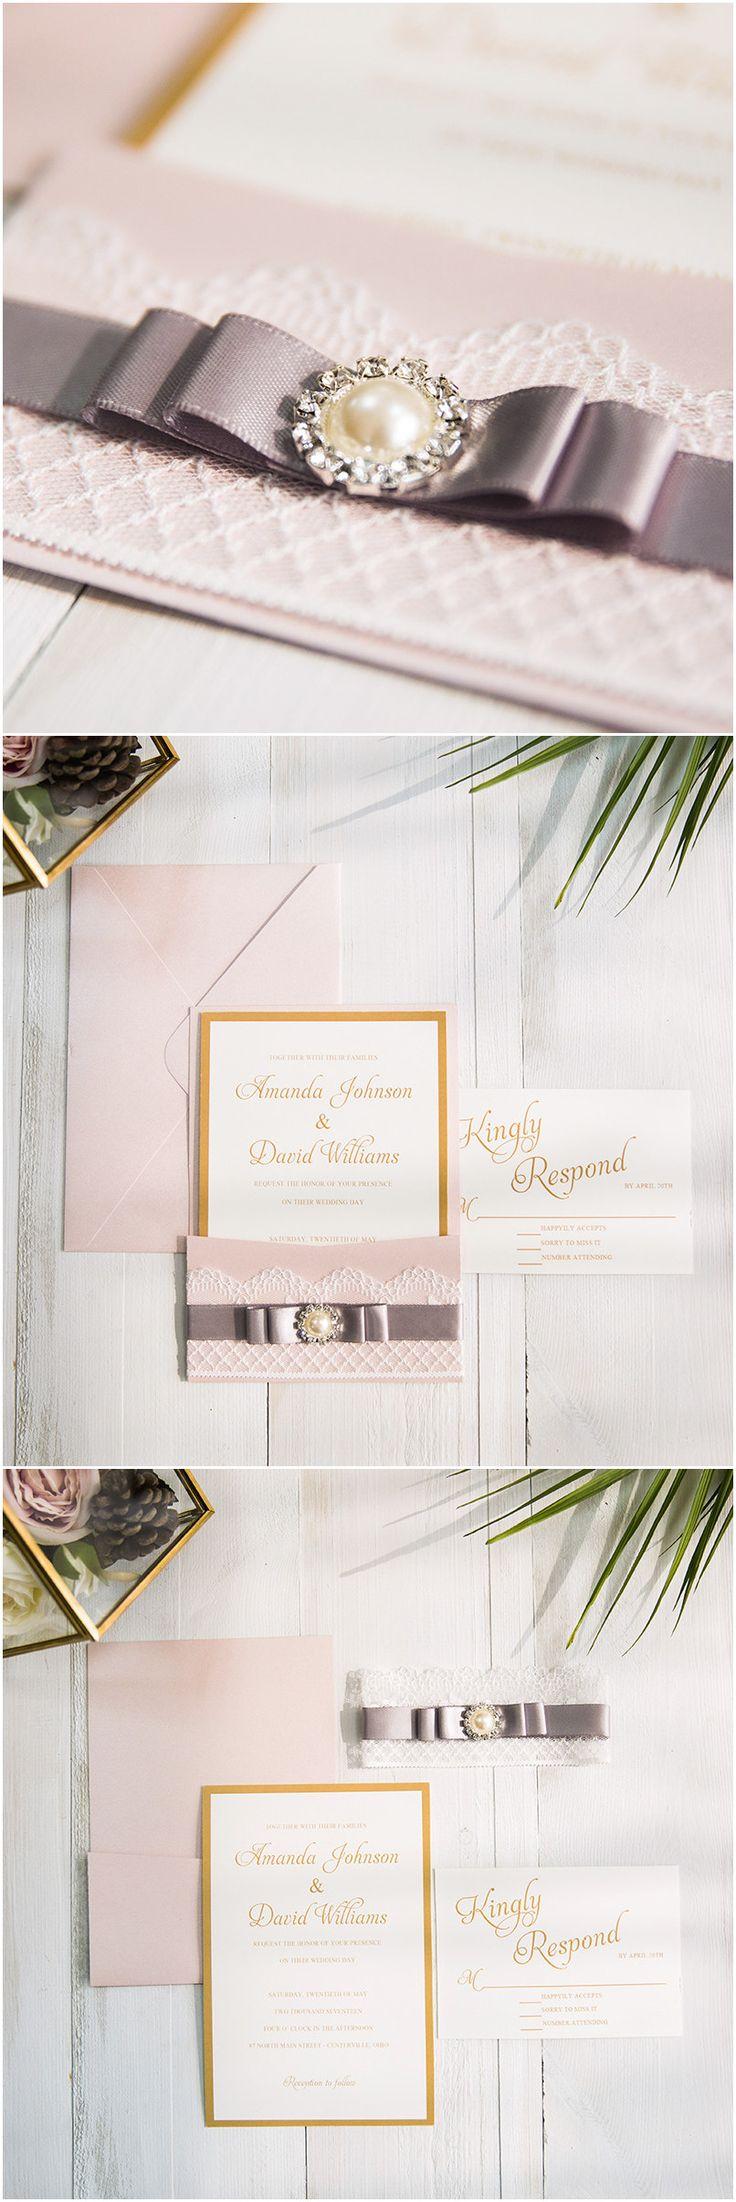 137 Best Wedding Invitations Images On Pinterest Wedding